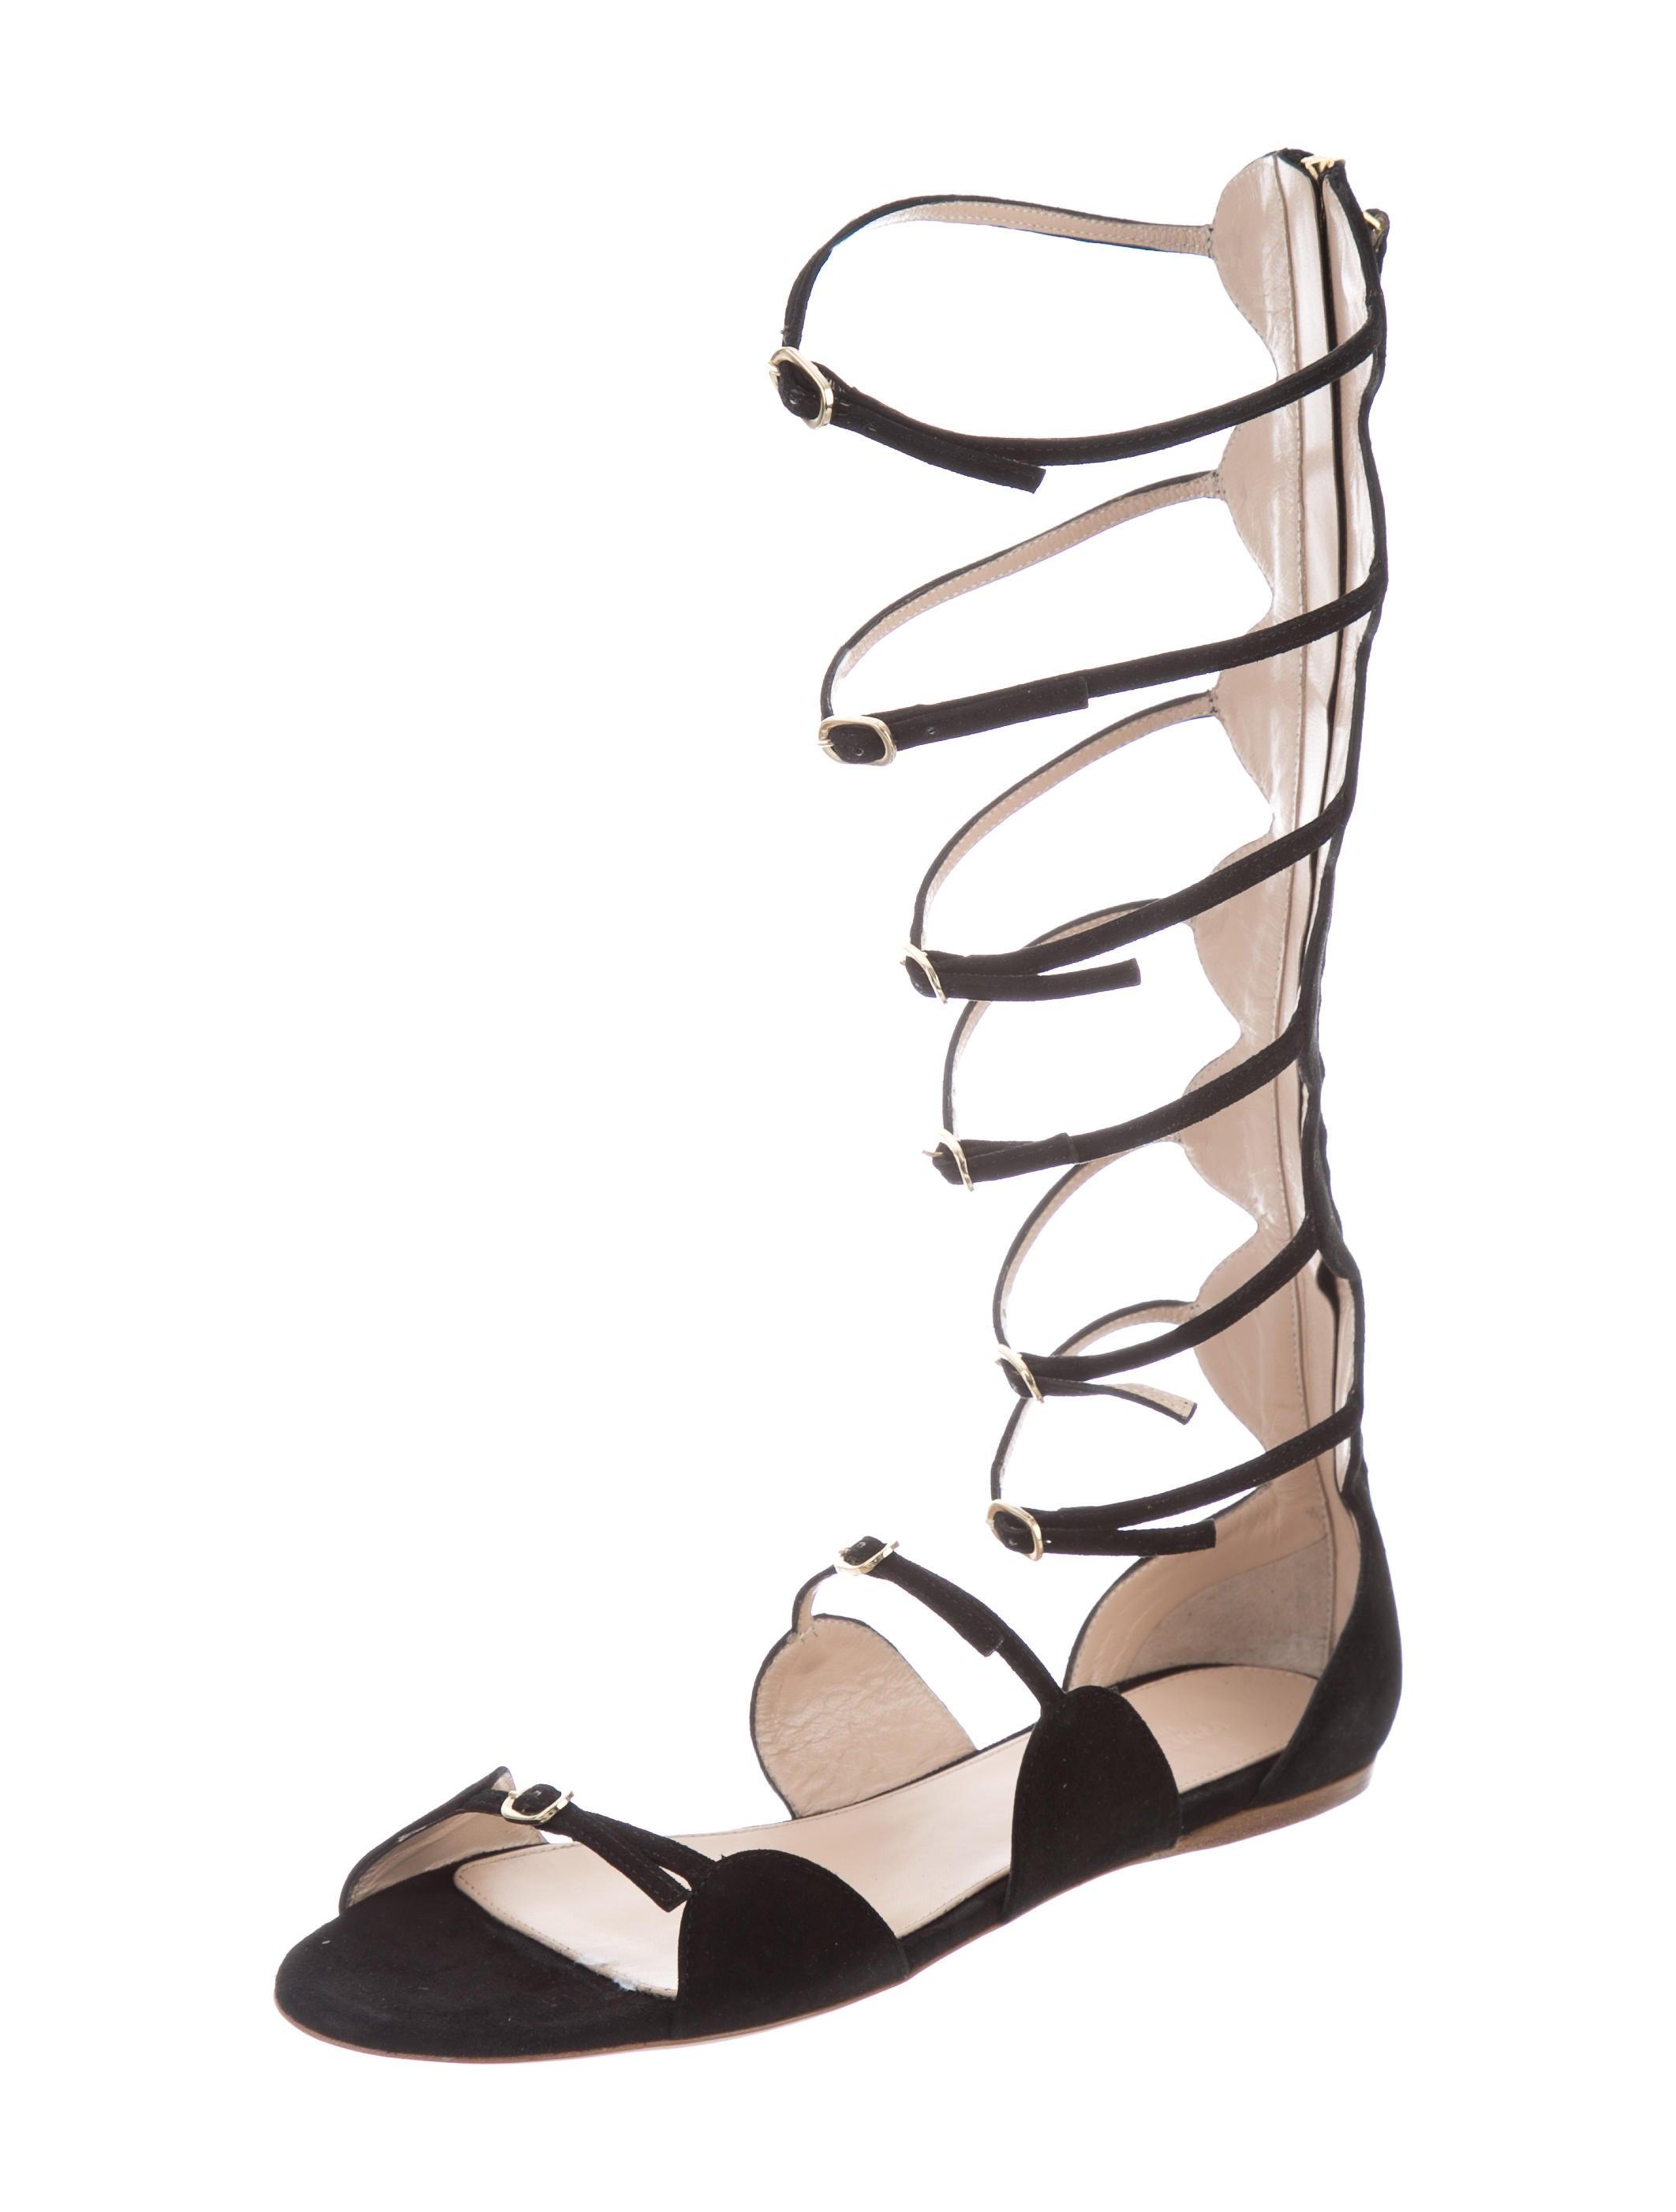 GIAMBATTISTA VALLI - Gladiator buckle strap stiletto